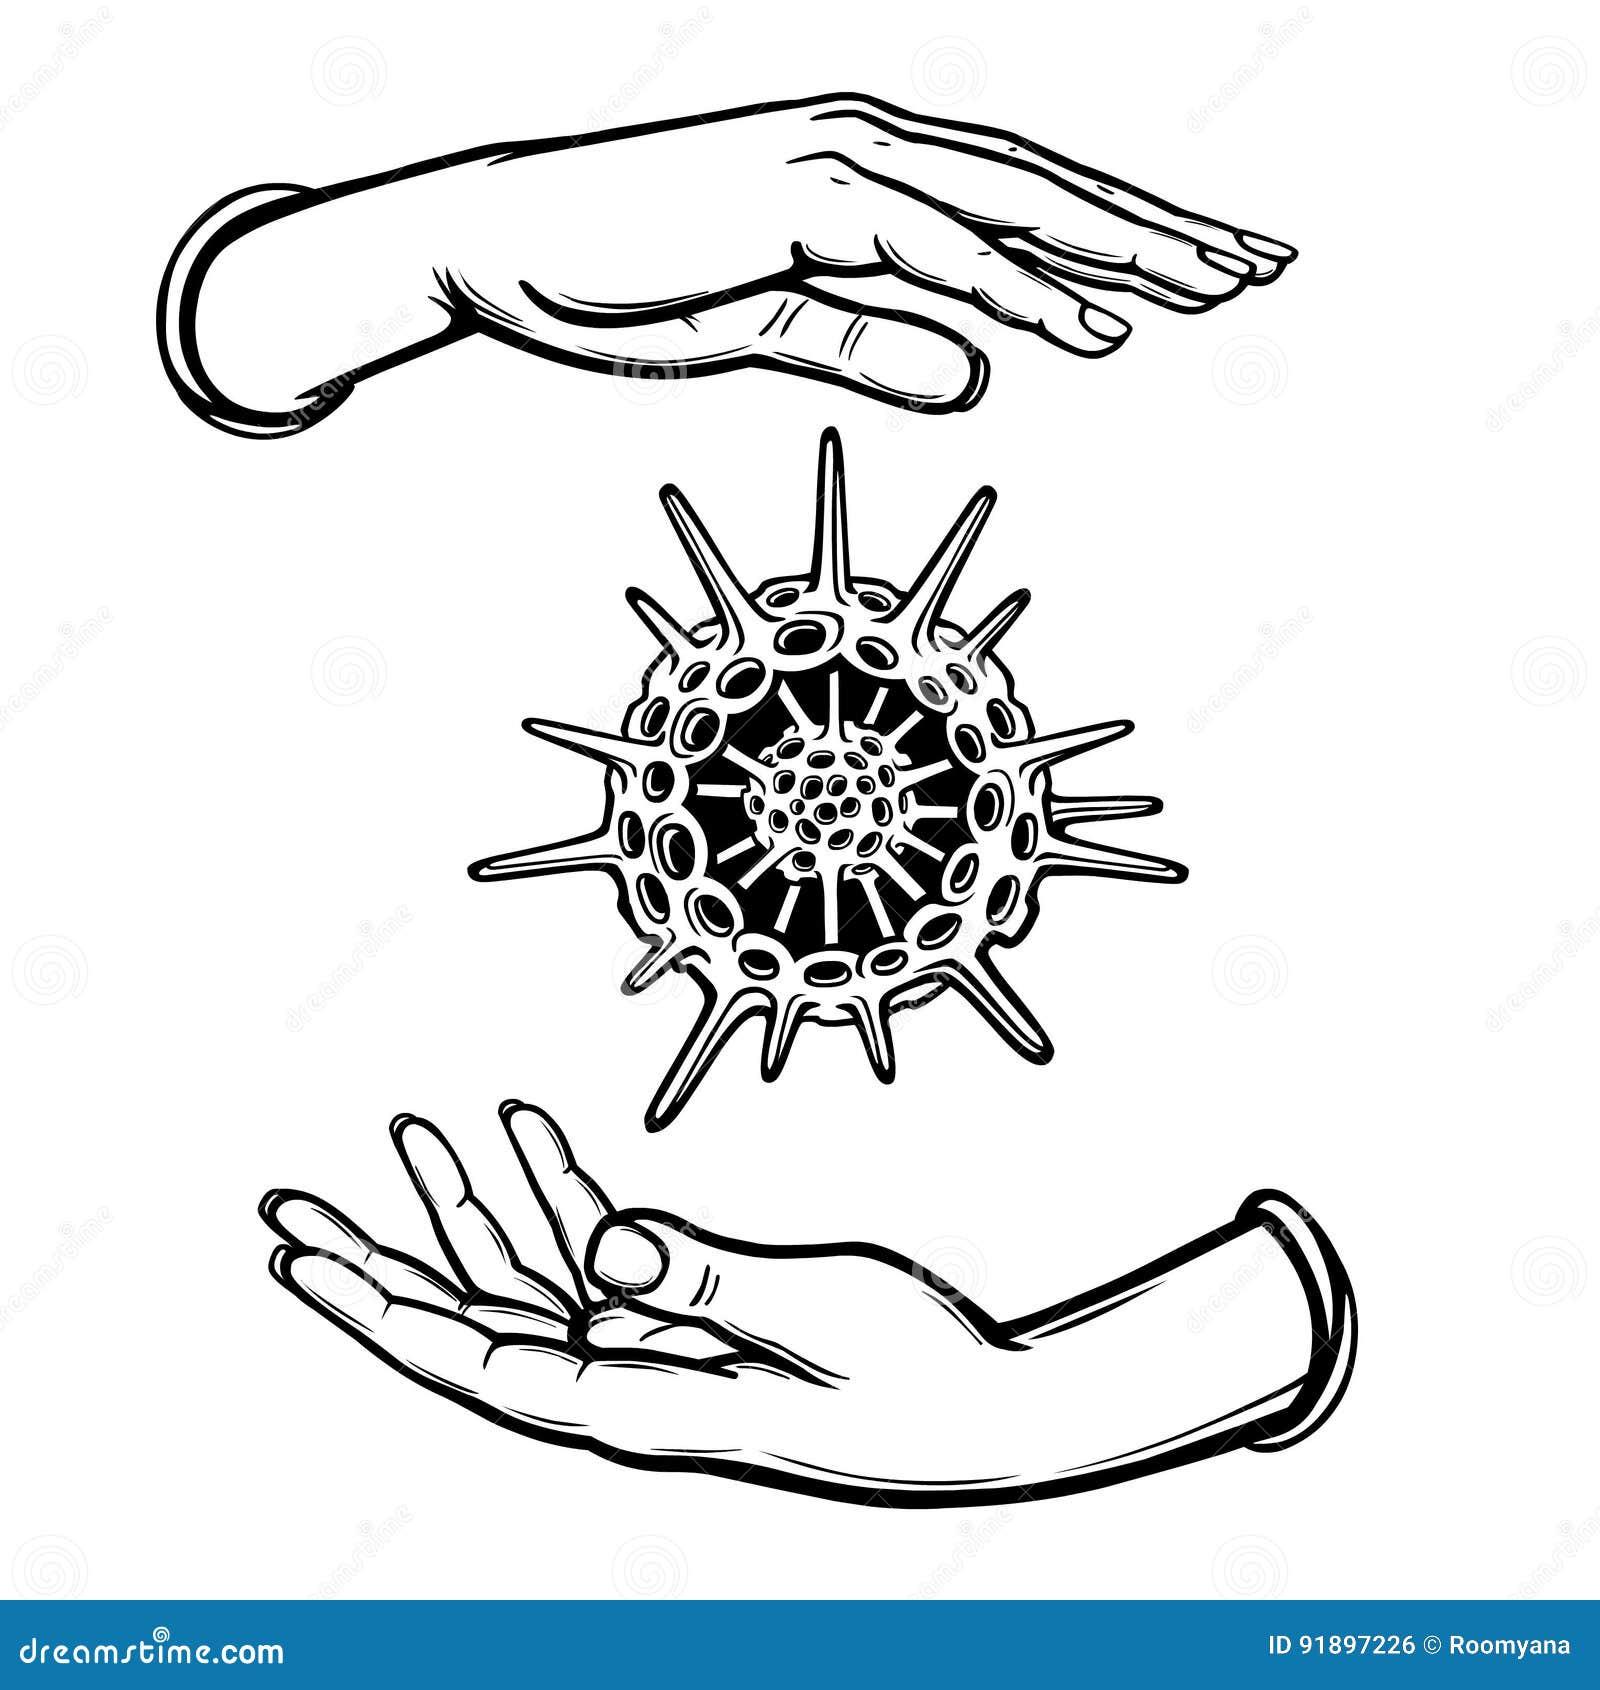 m u00e4nskliga h u00e4nder rymmer ett skelett av en radiolaria f u00f6r f u00e4rgl u00e4ggningdiagram f u00f6r bok f u00e4rgrik